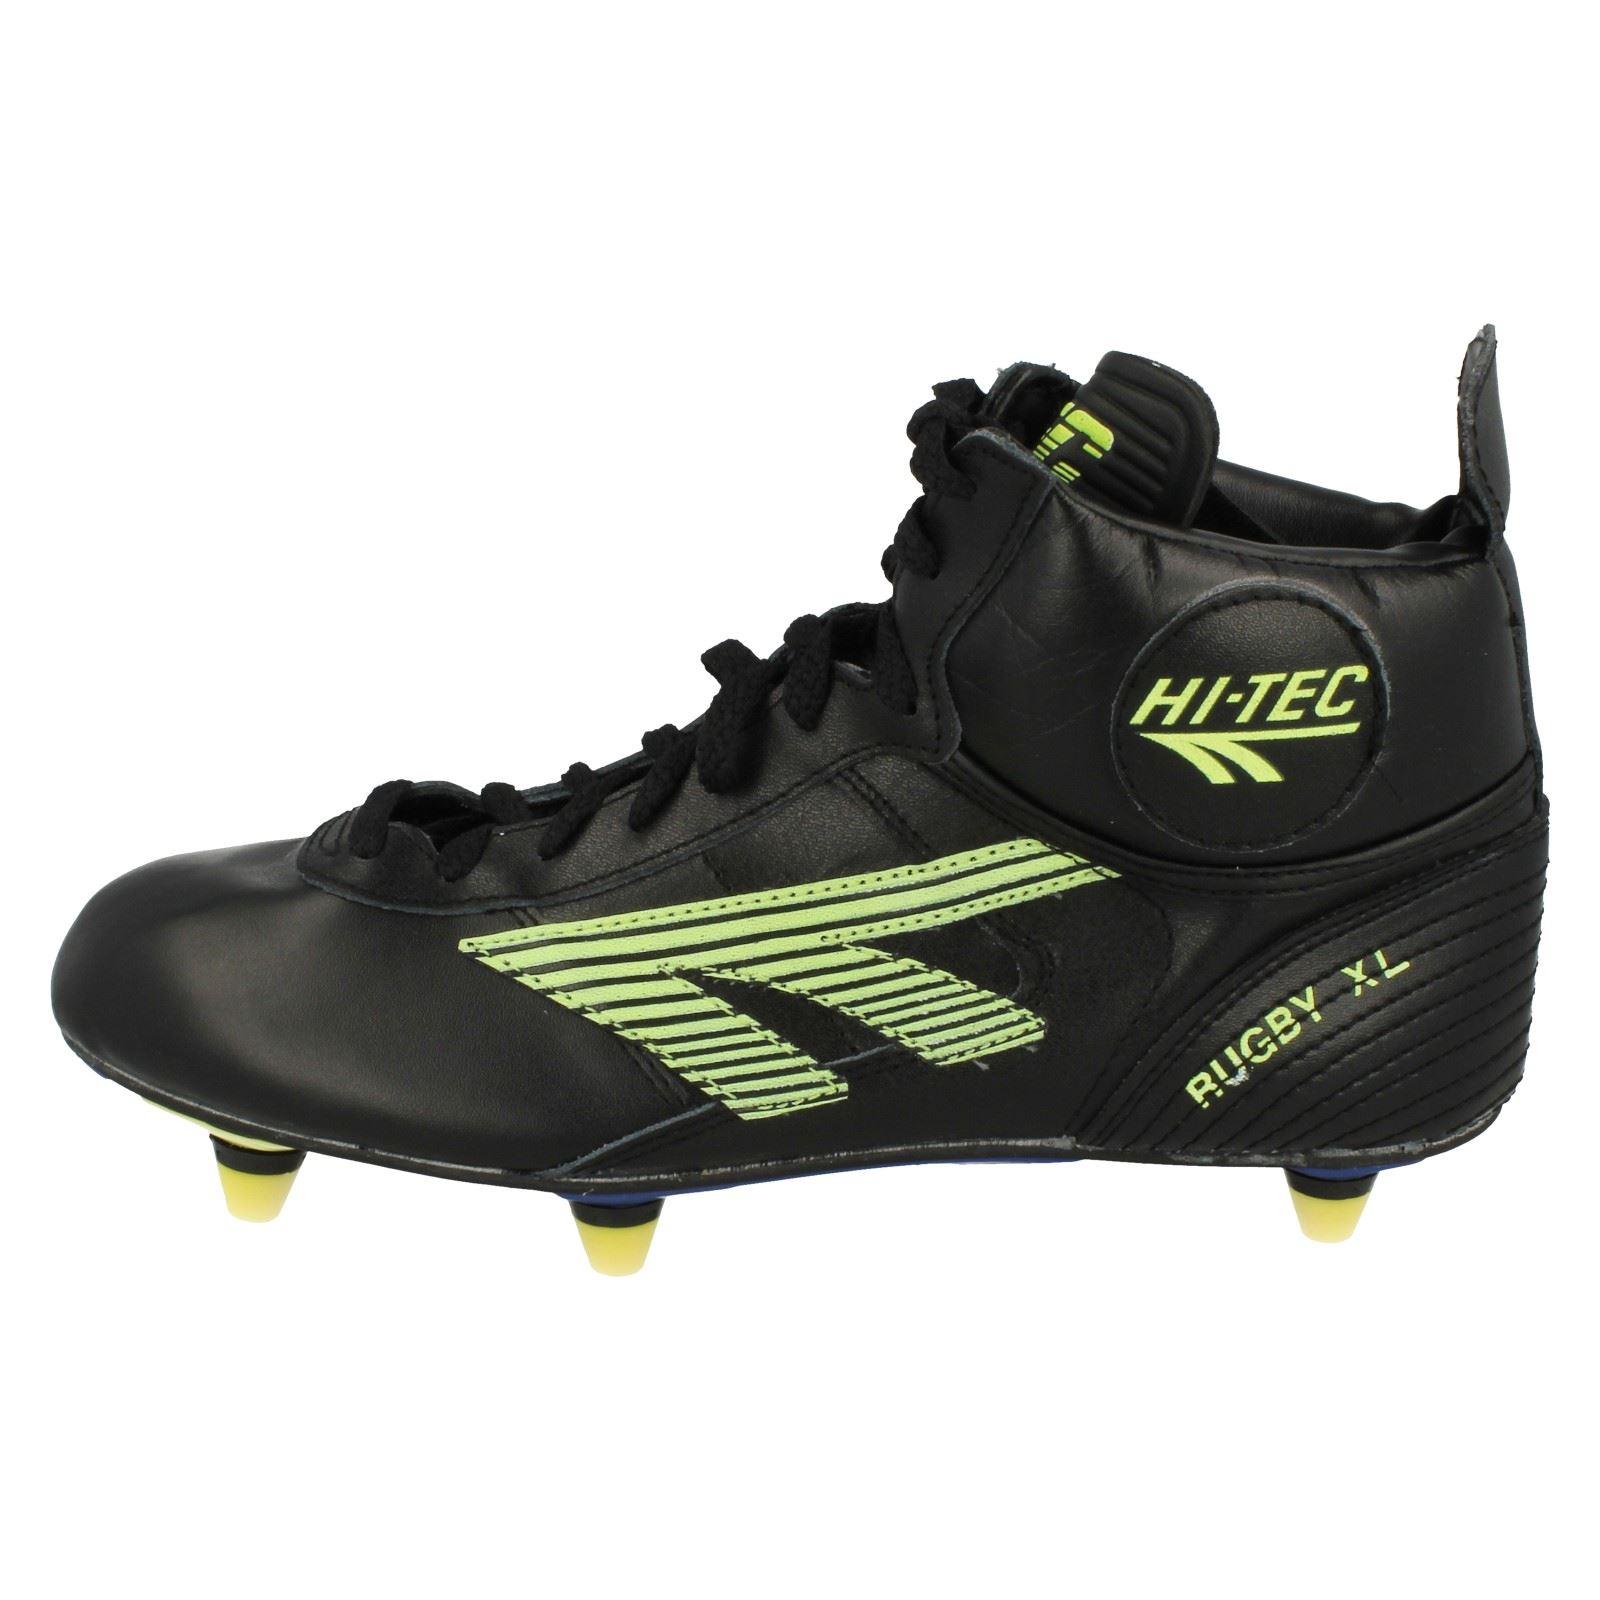 615b7aa9a494 Hi-Tec-Mens-Rugby-Boots-Rugby-XL thumbnail 3